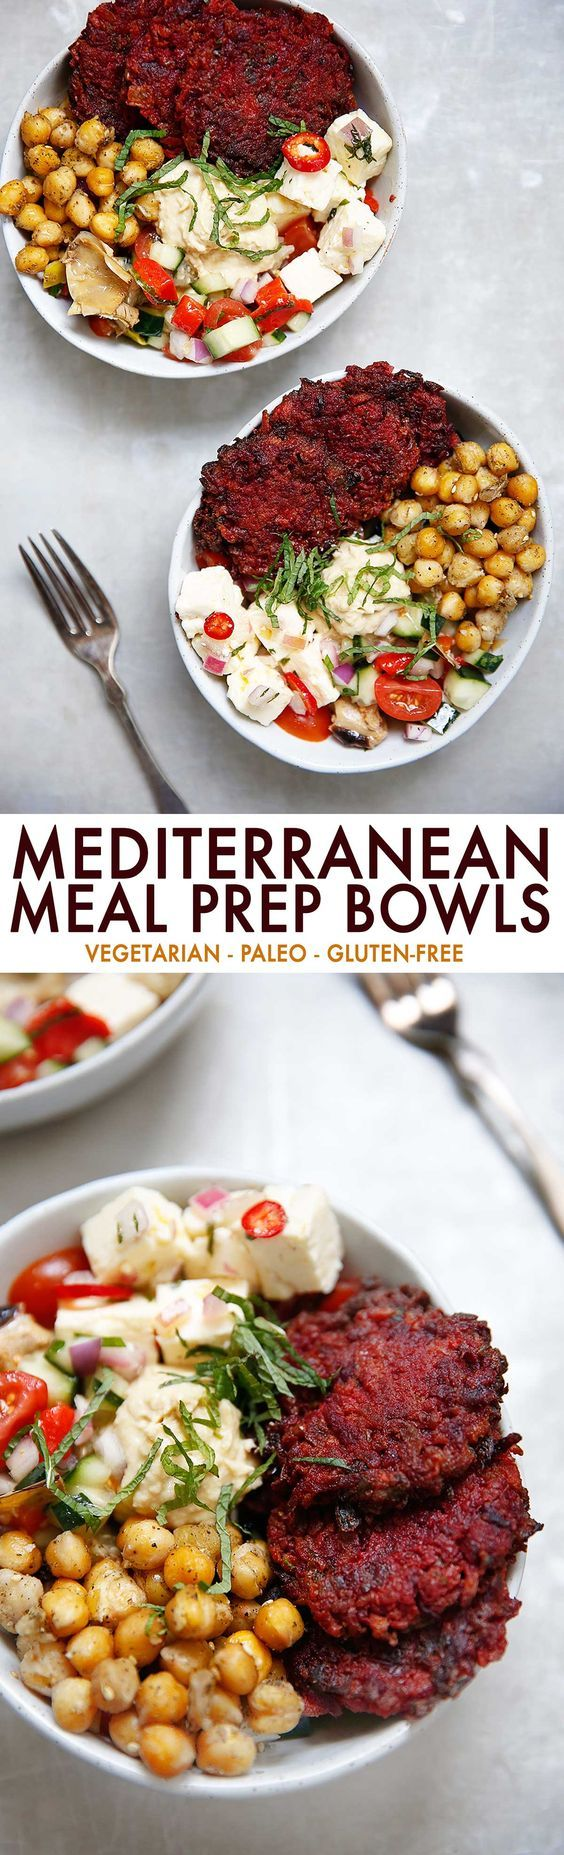 Meal Prep Mediterranean Bowls   Lexi's Clean Kitchen